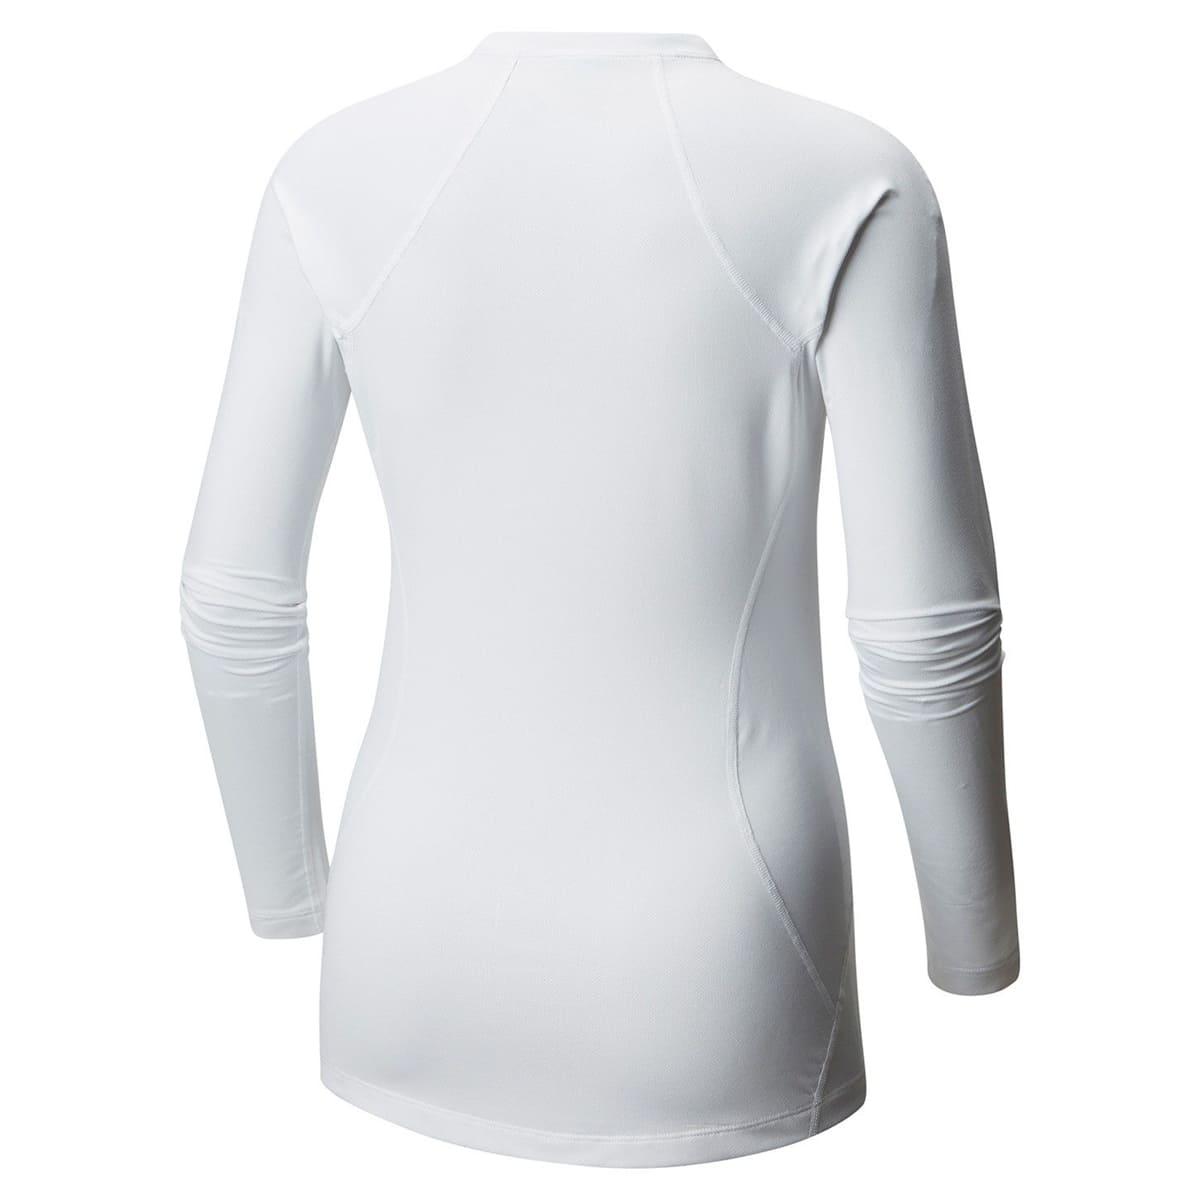 Camiseta/ Blusa Segunda Pele Manga Longa Térmica Columbia Midweight II Long Sleeve Top Feminina Preta